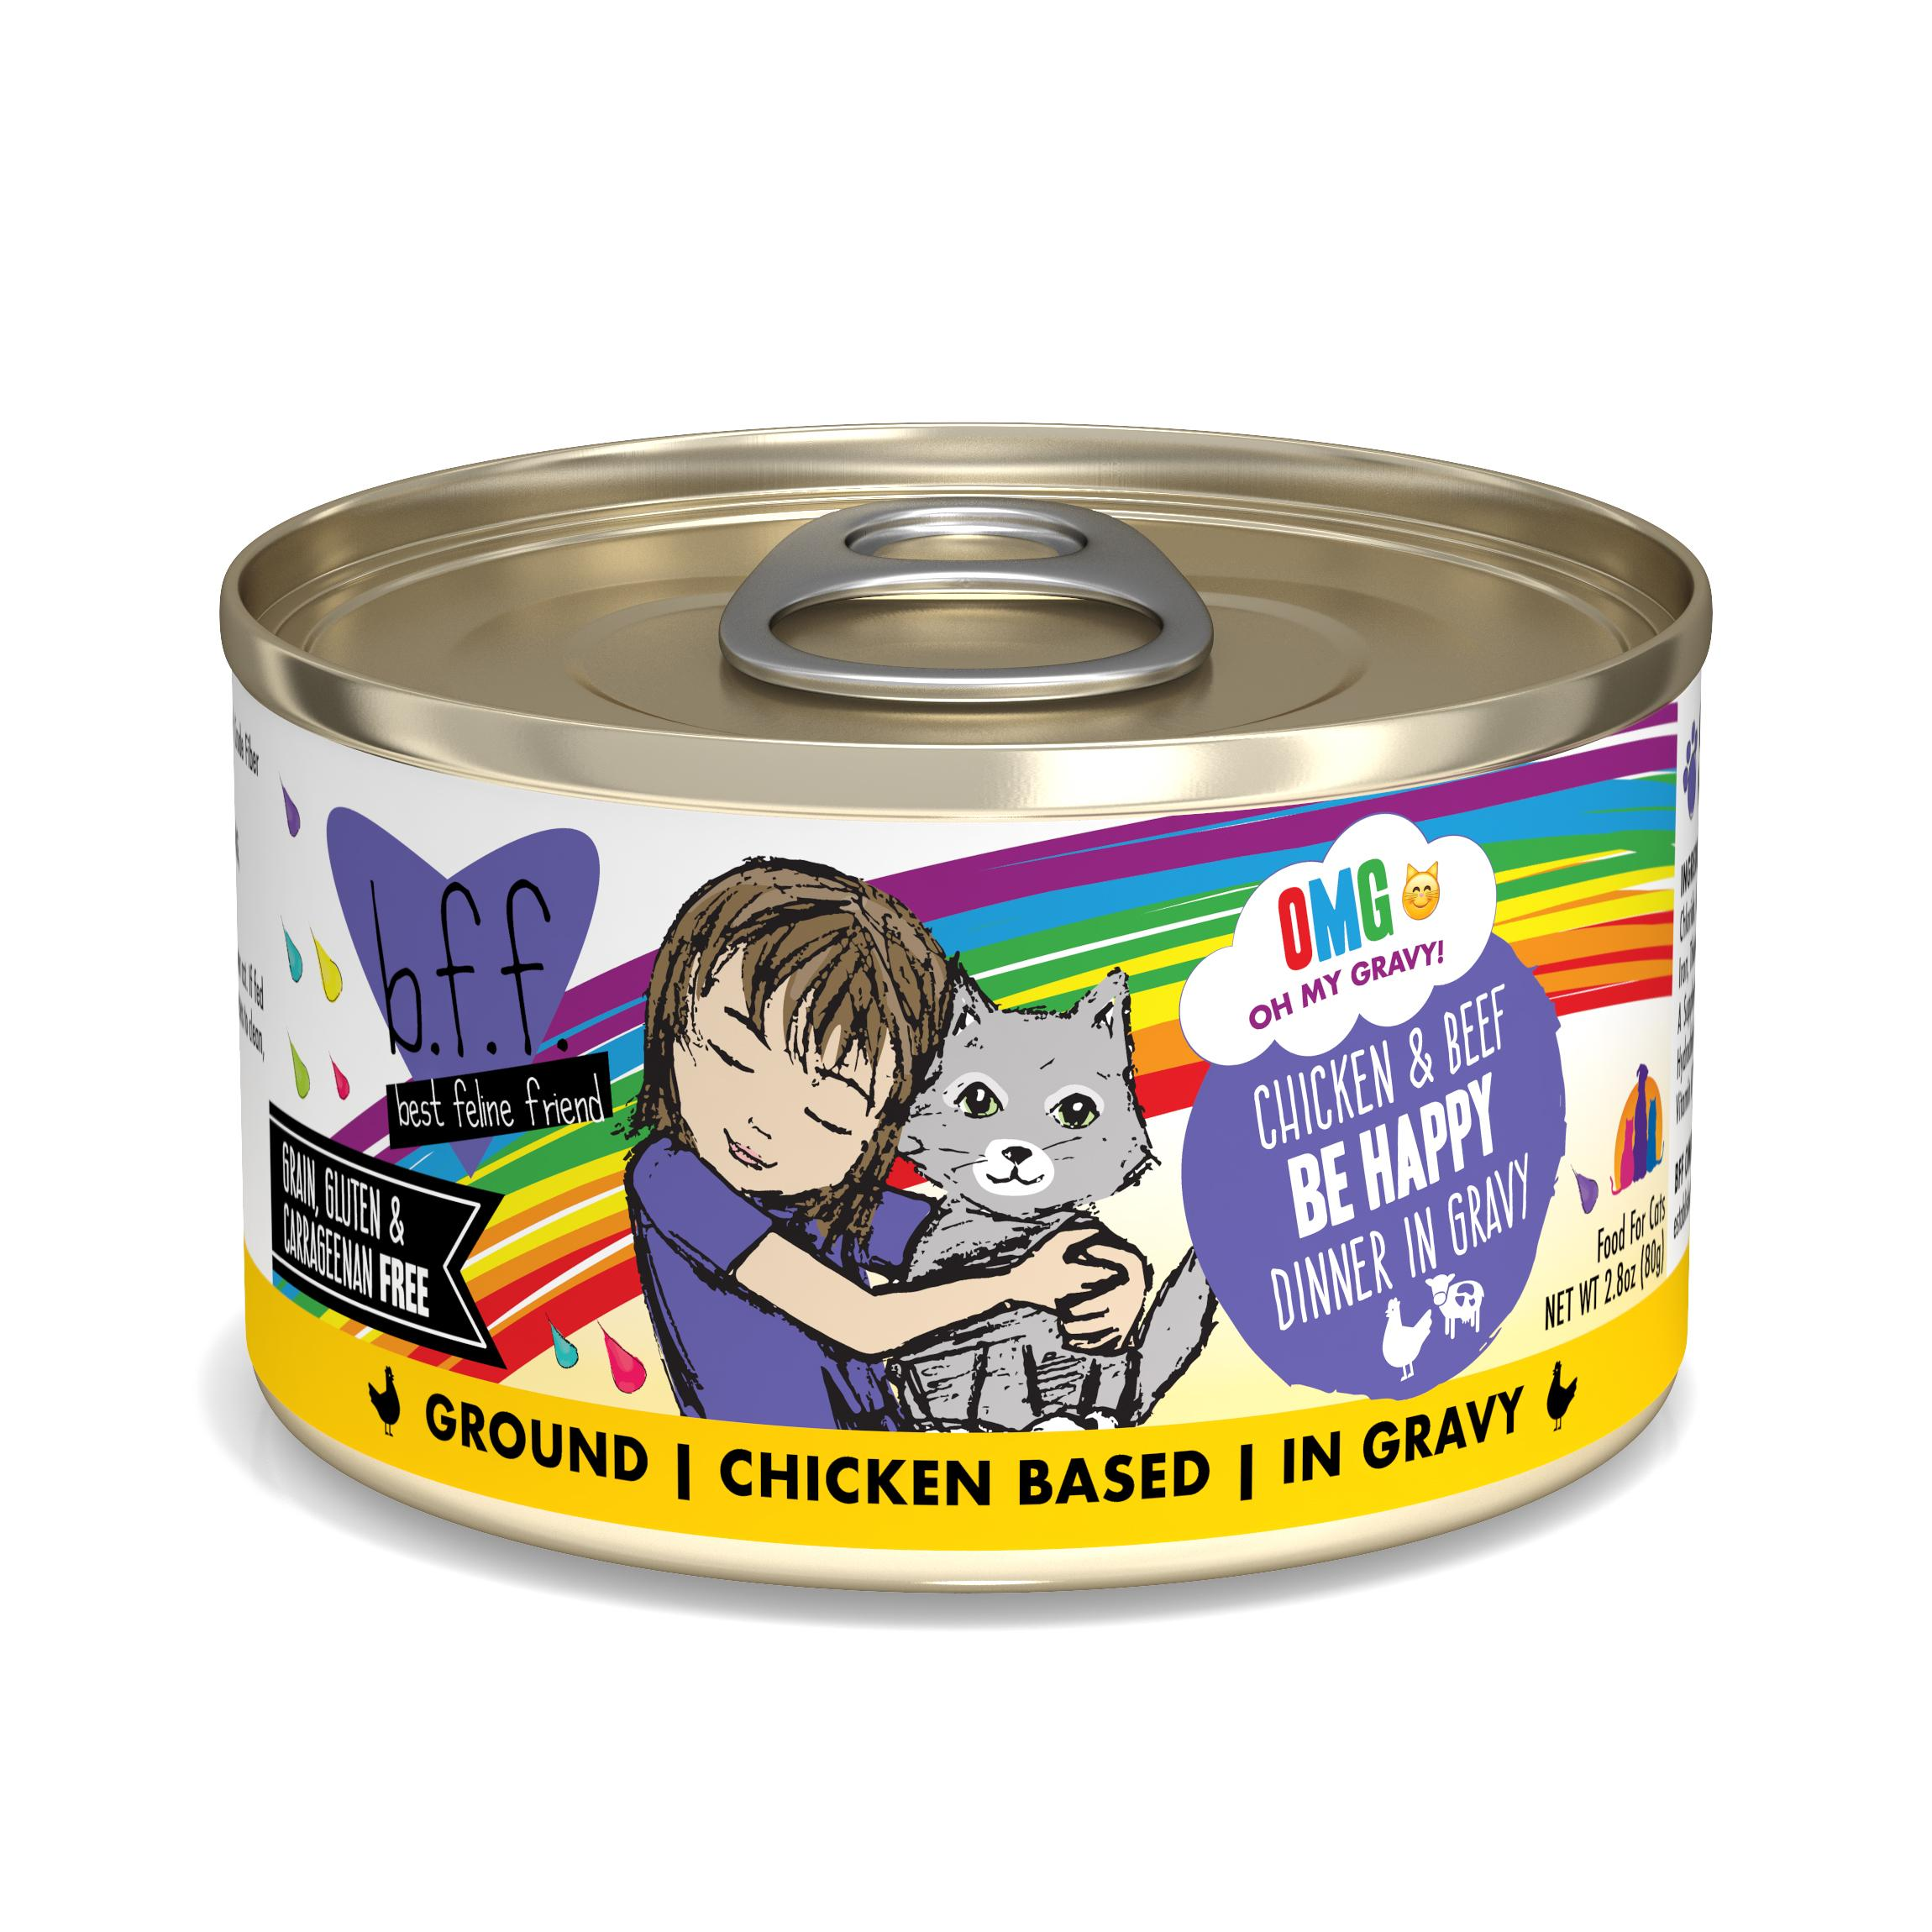 BFF Oh My Gravy! Be Happy! Chicken & Beef Dinner in Gravy Grain-Free Wet Cat Food, 2.8-oz